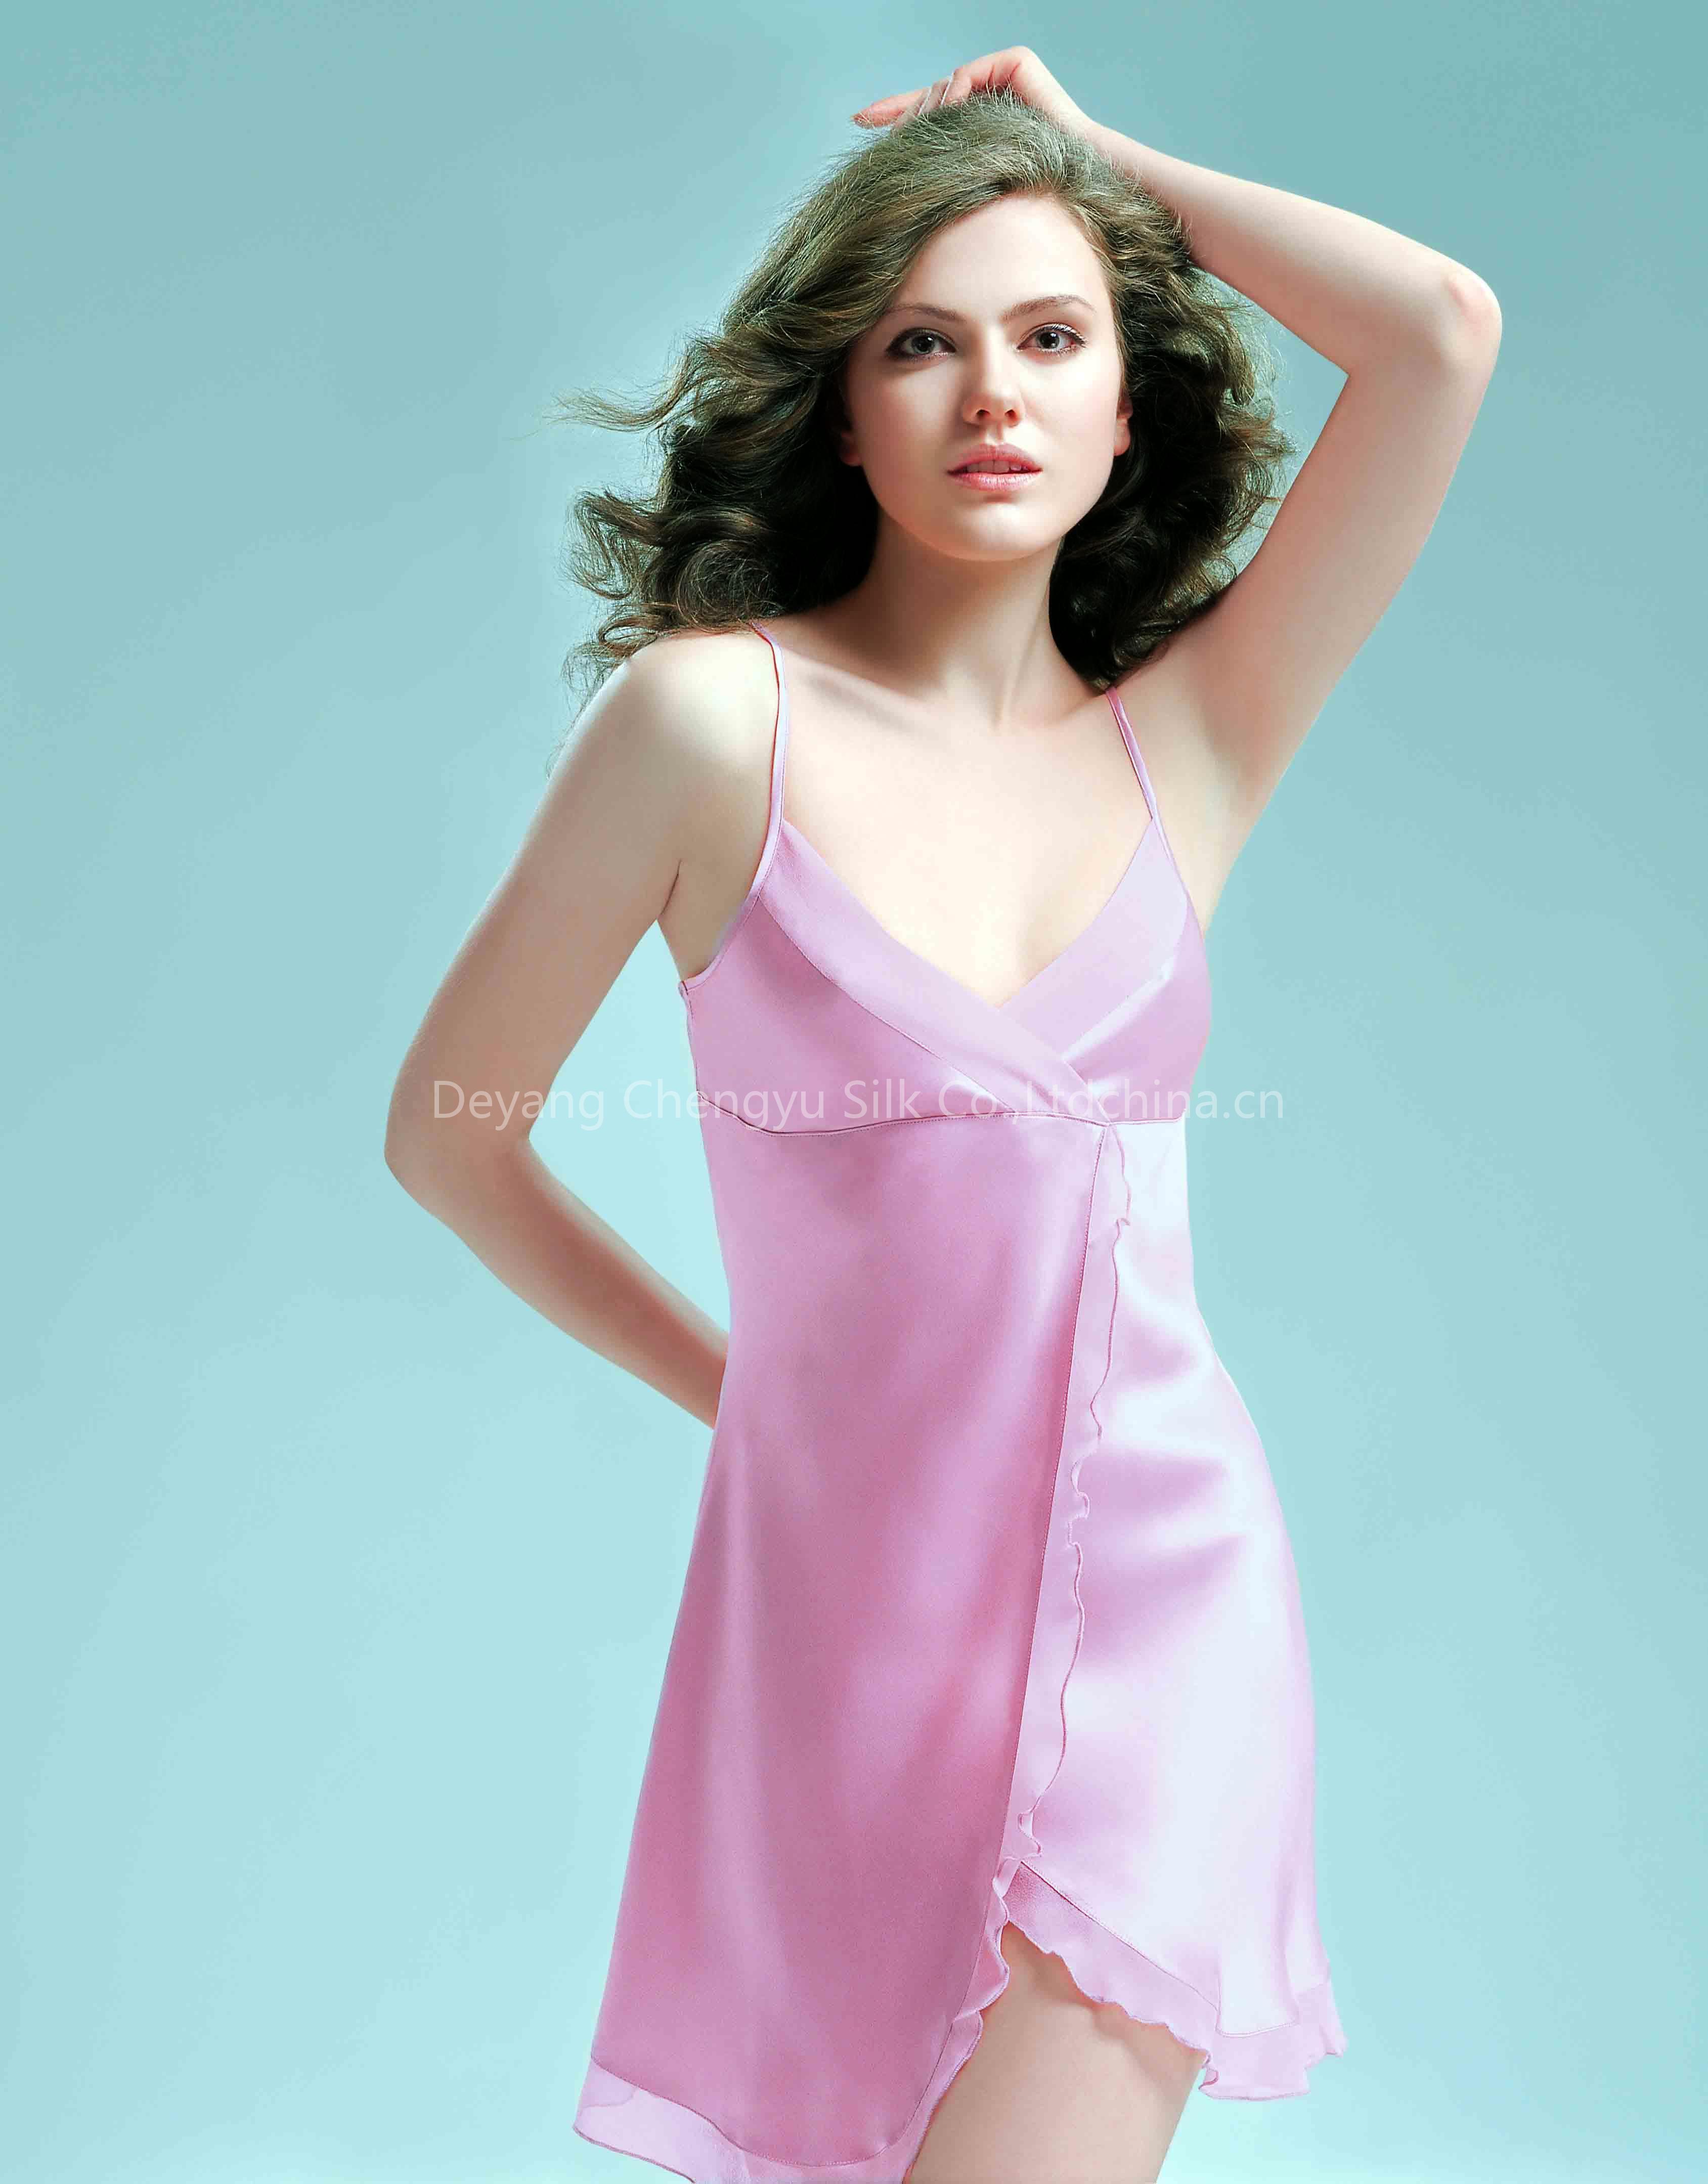 silk dress,silk nightwear,pajama,nightwear,evening gown,wedding ...